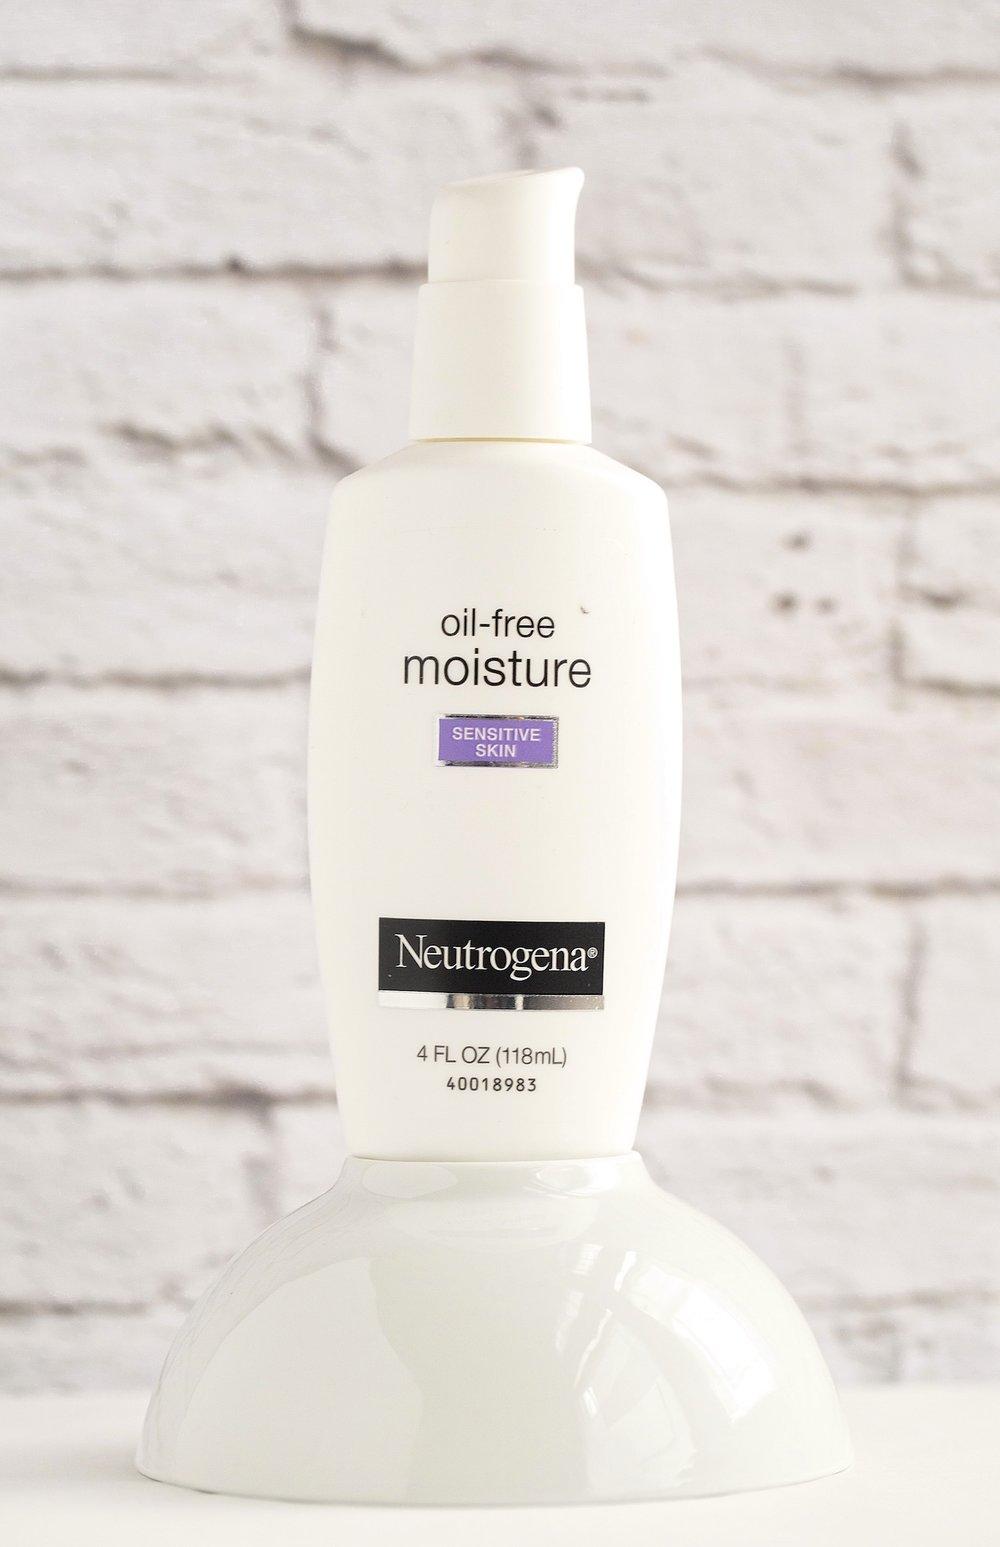 New Beauty Products I'm Loving - Neutrogena Oil Free Moisture | TrufflesandTrends.com